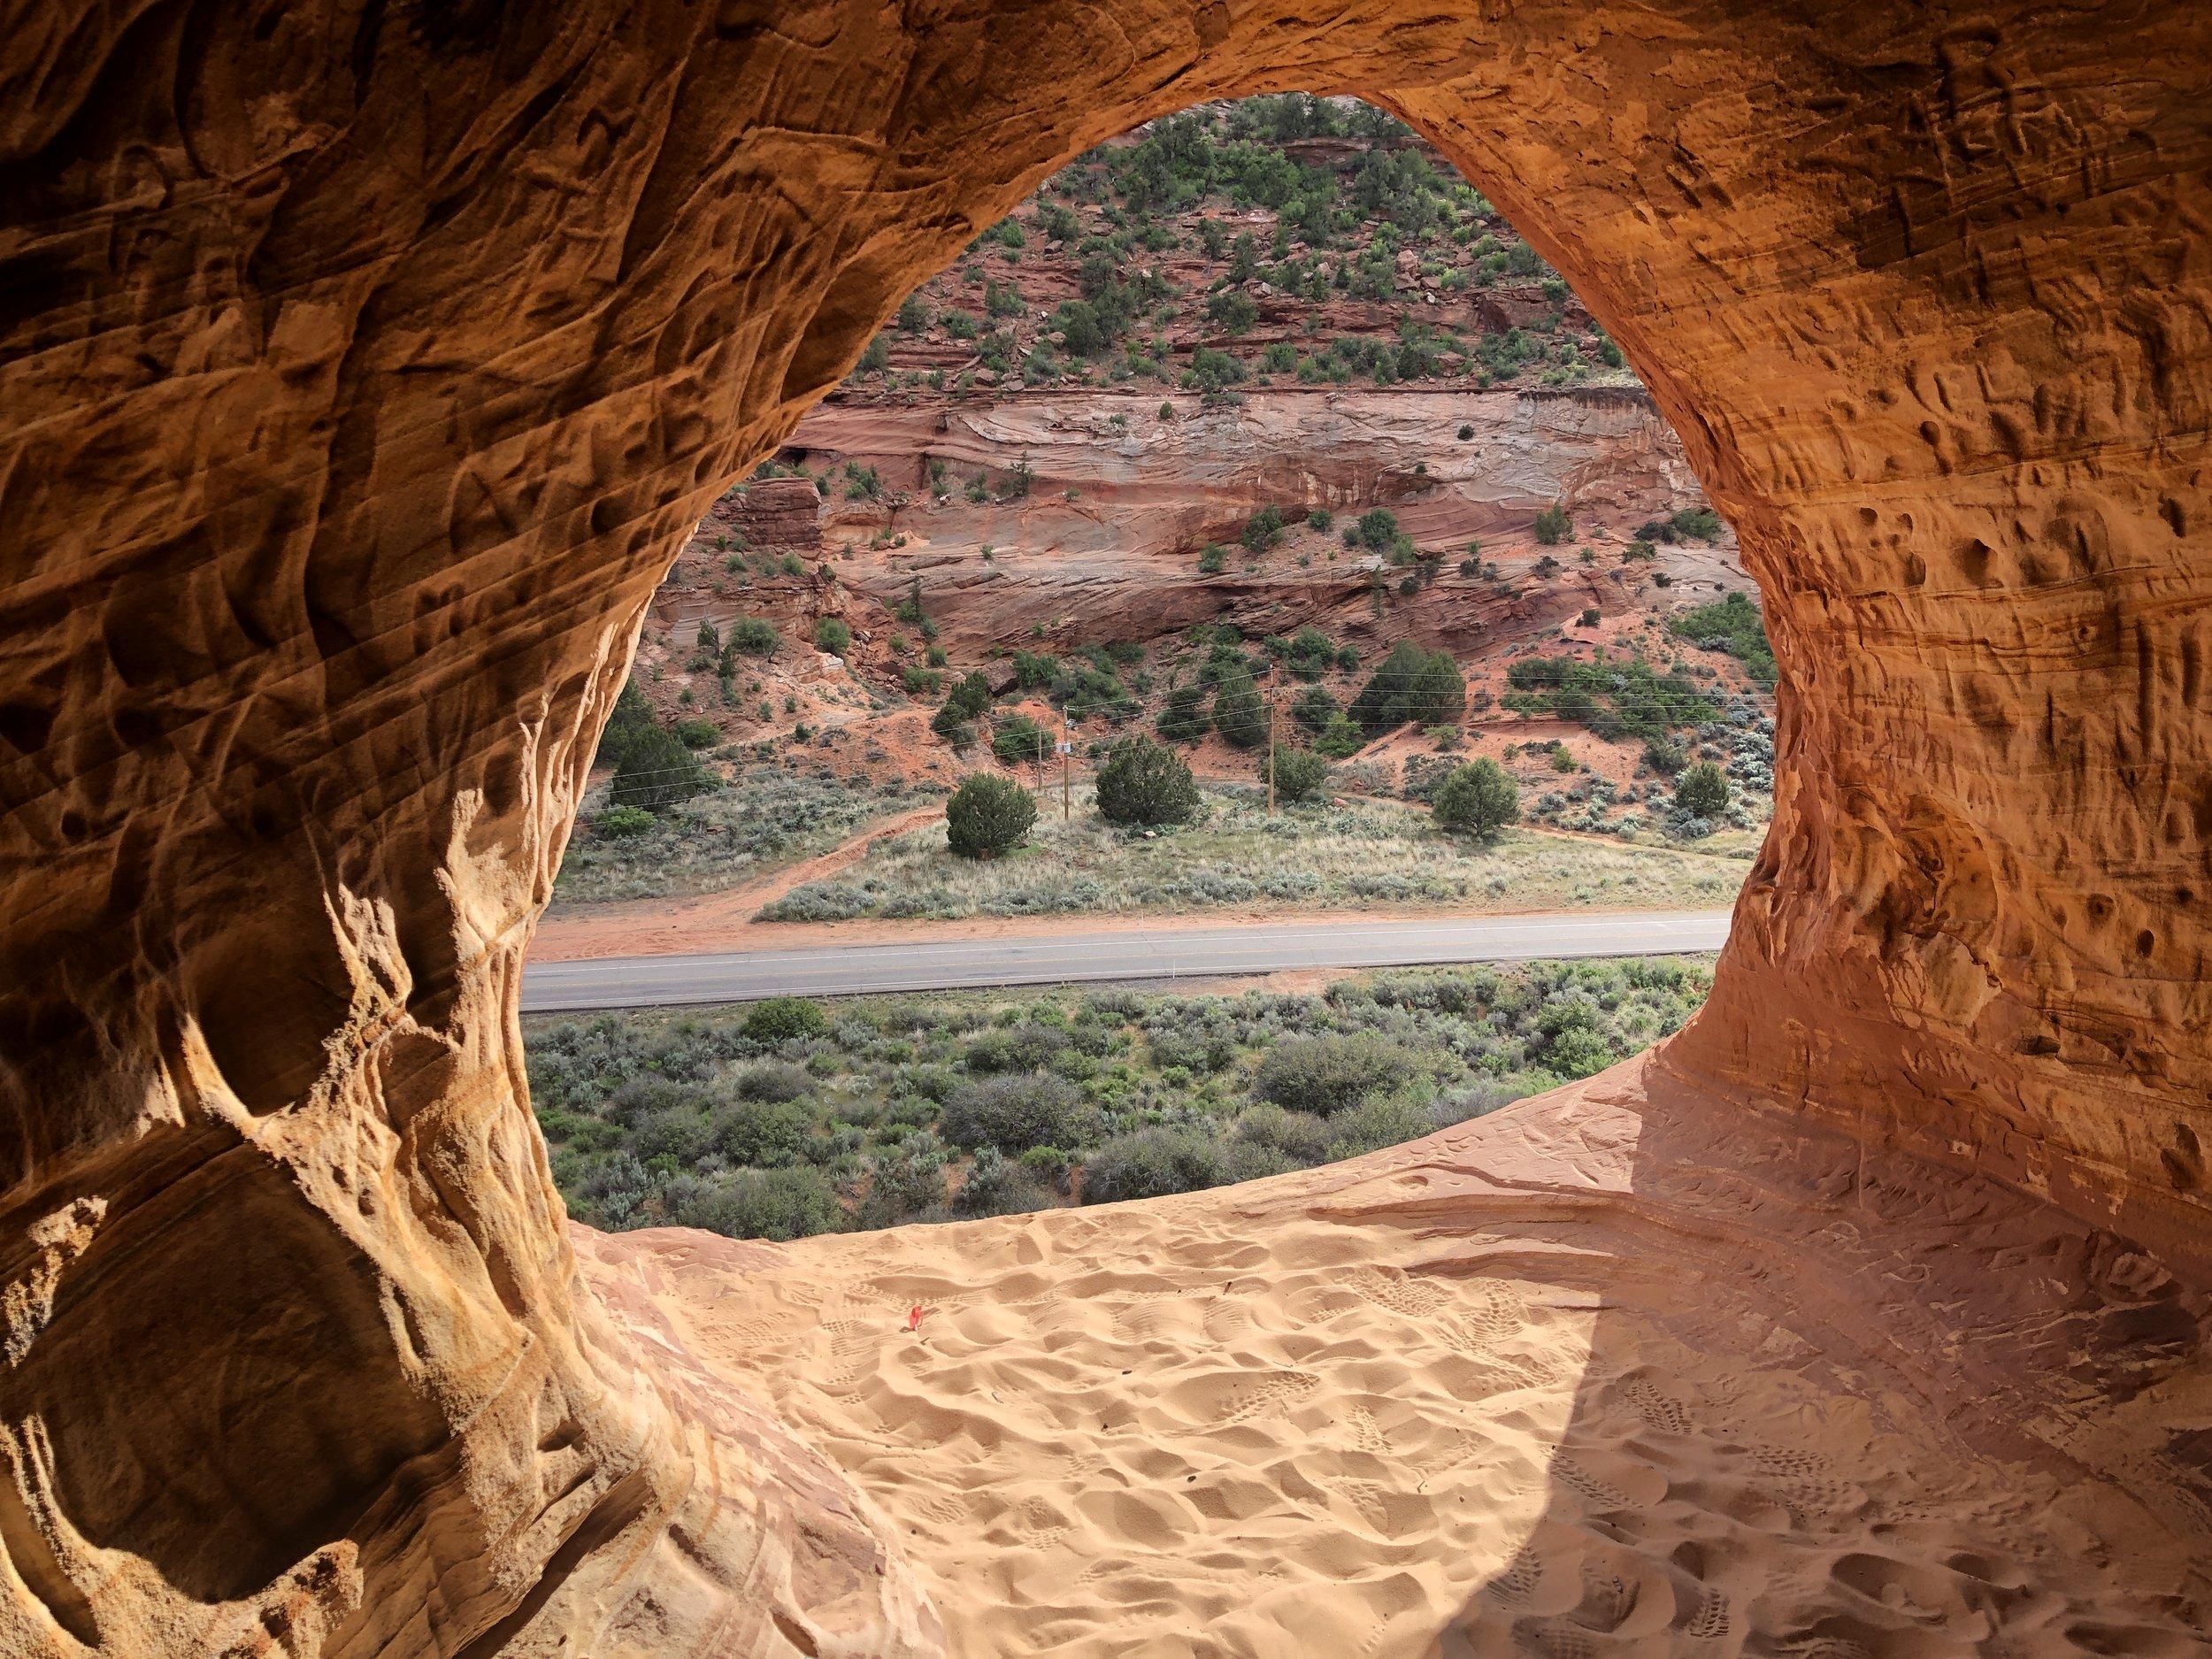 moki-moqui-cave-utah-kanab-out-office-adventure